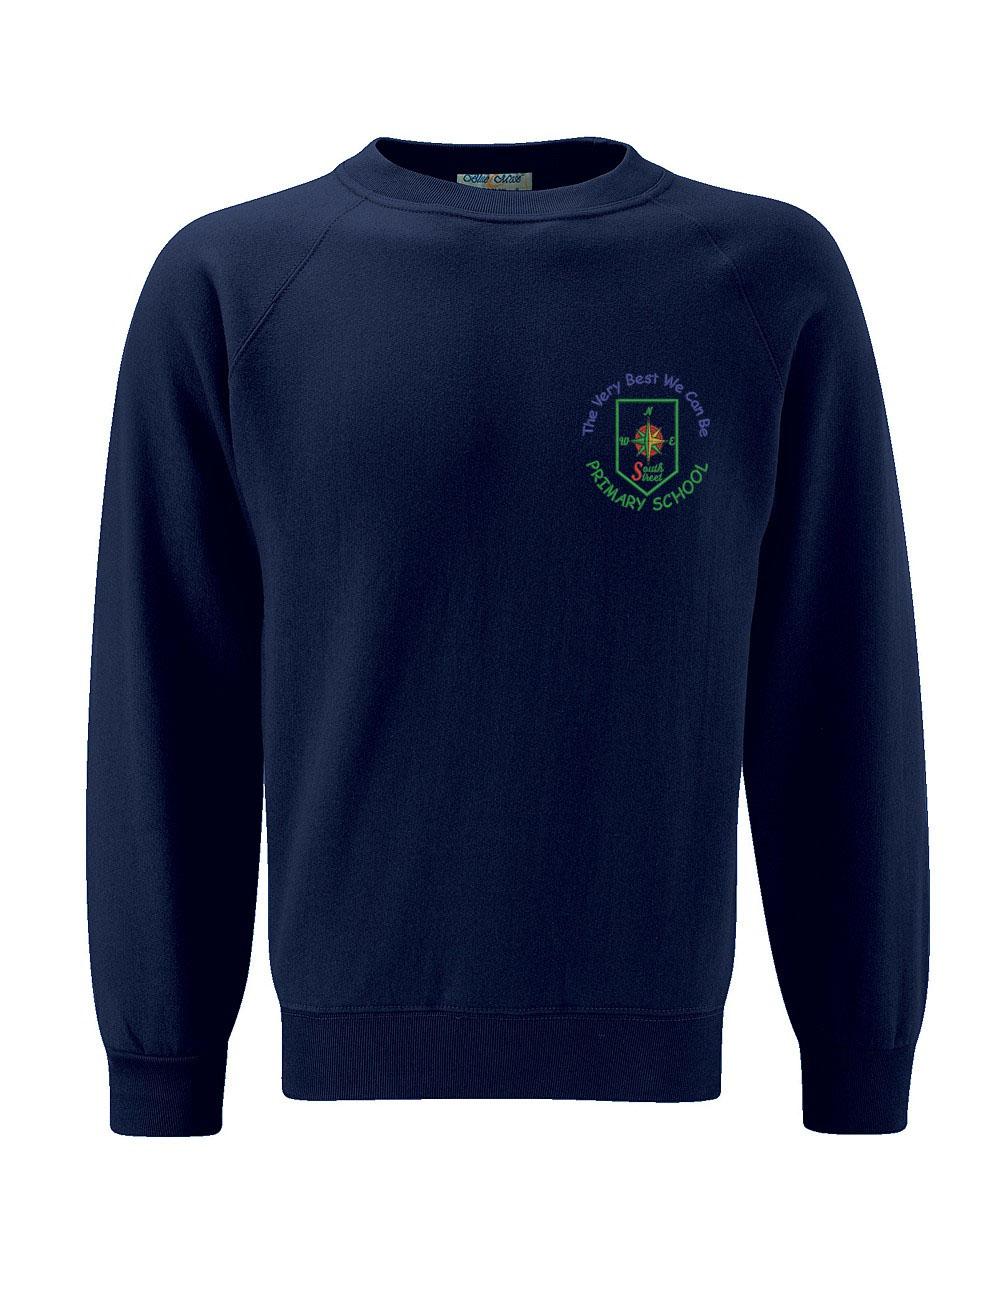 South Street Sweatshirt